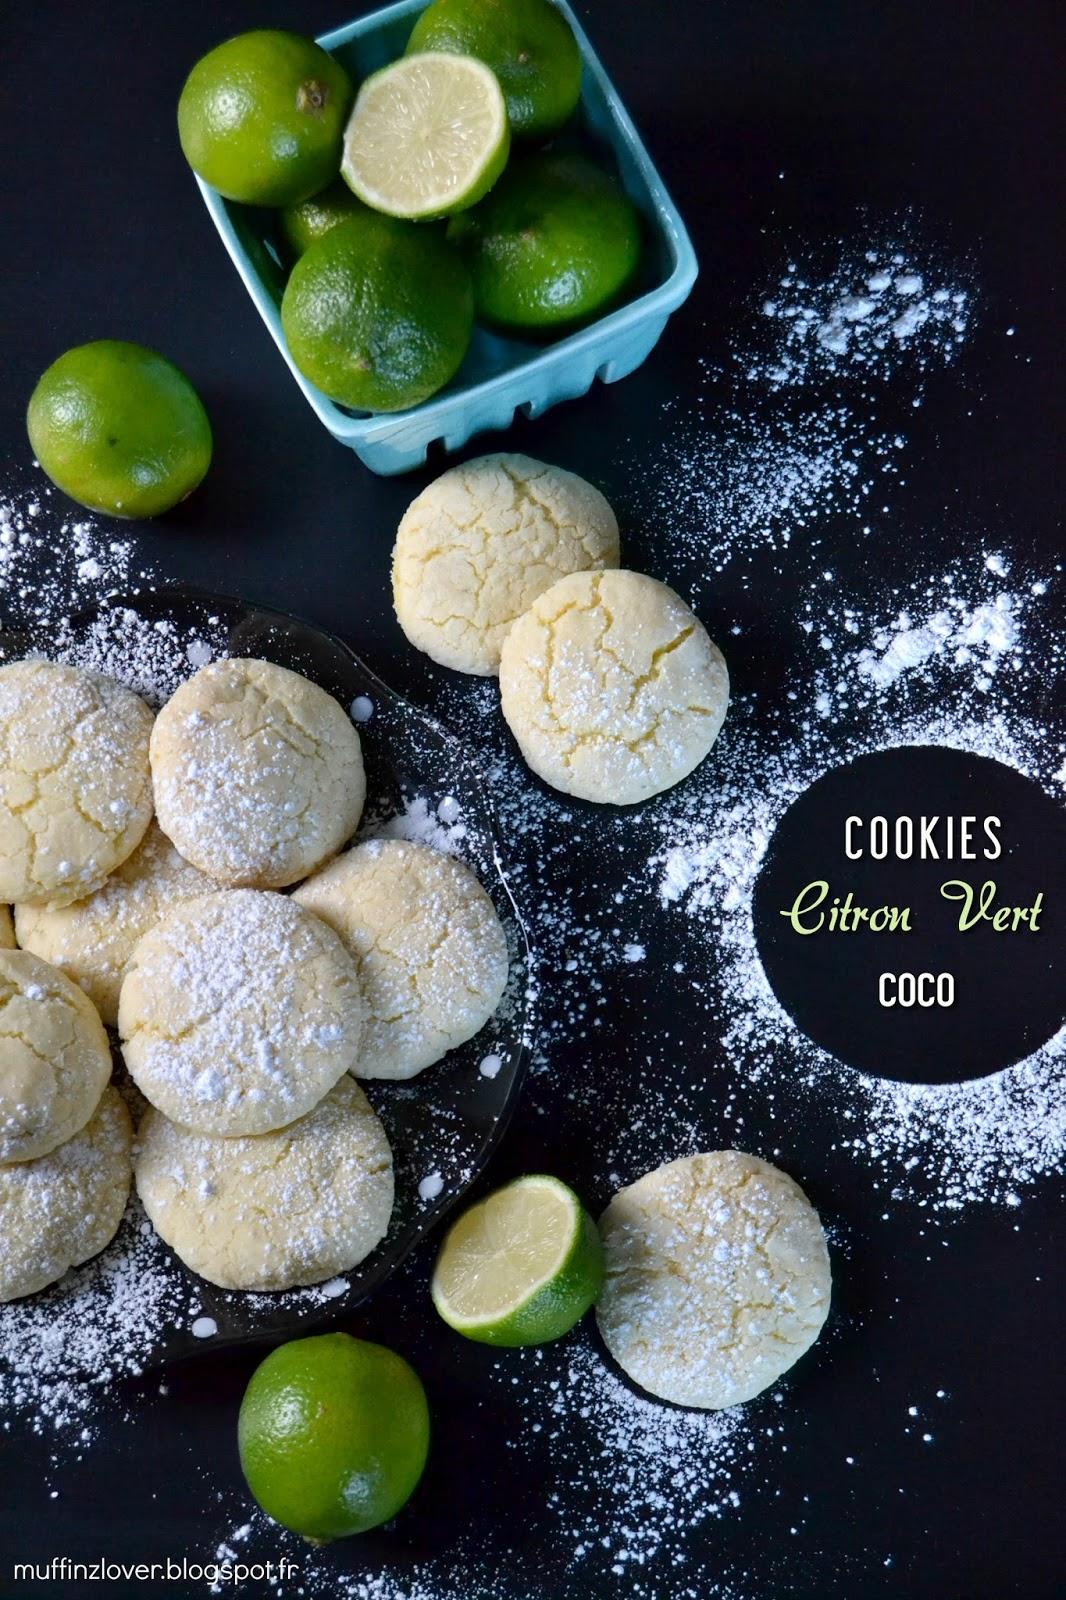 Recette cookies citron vert et coco - muffinzlover.blogspot.fr